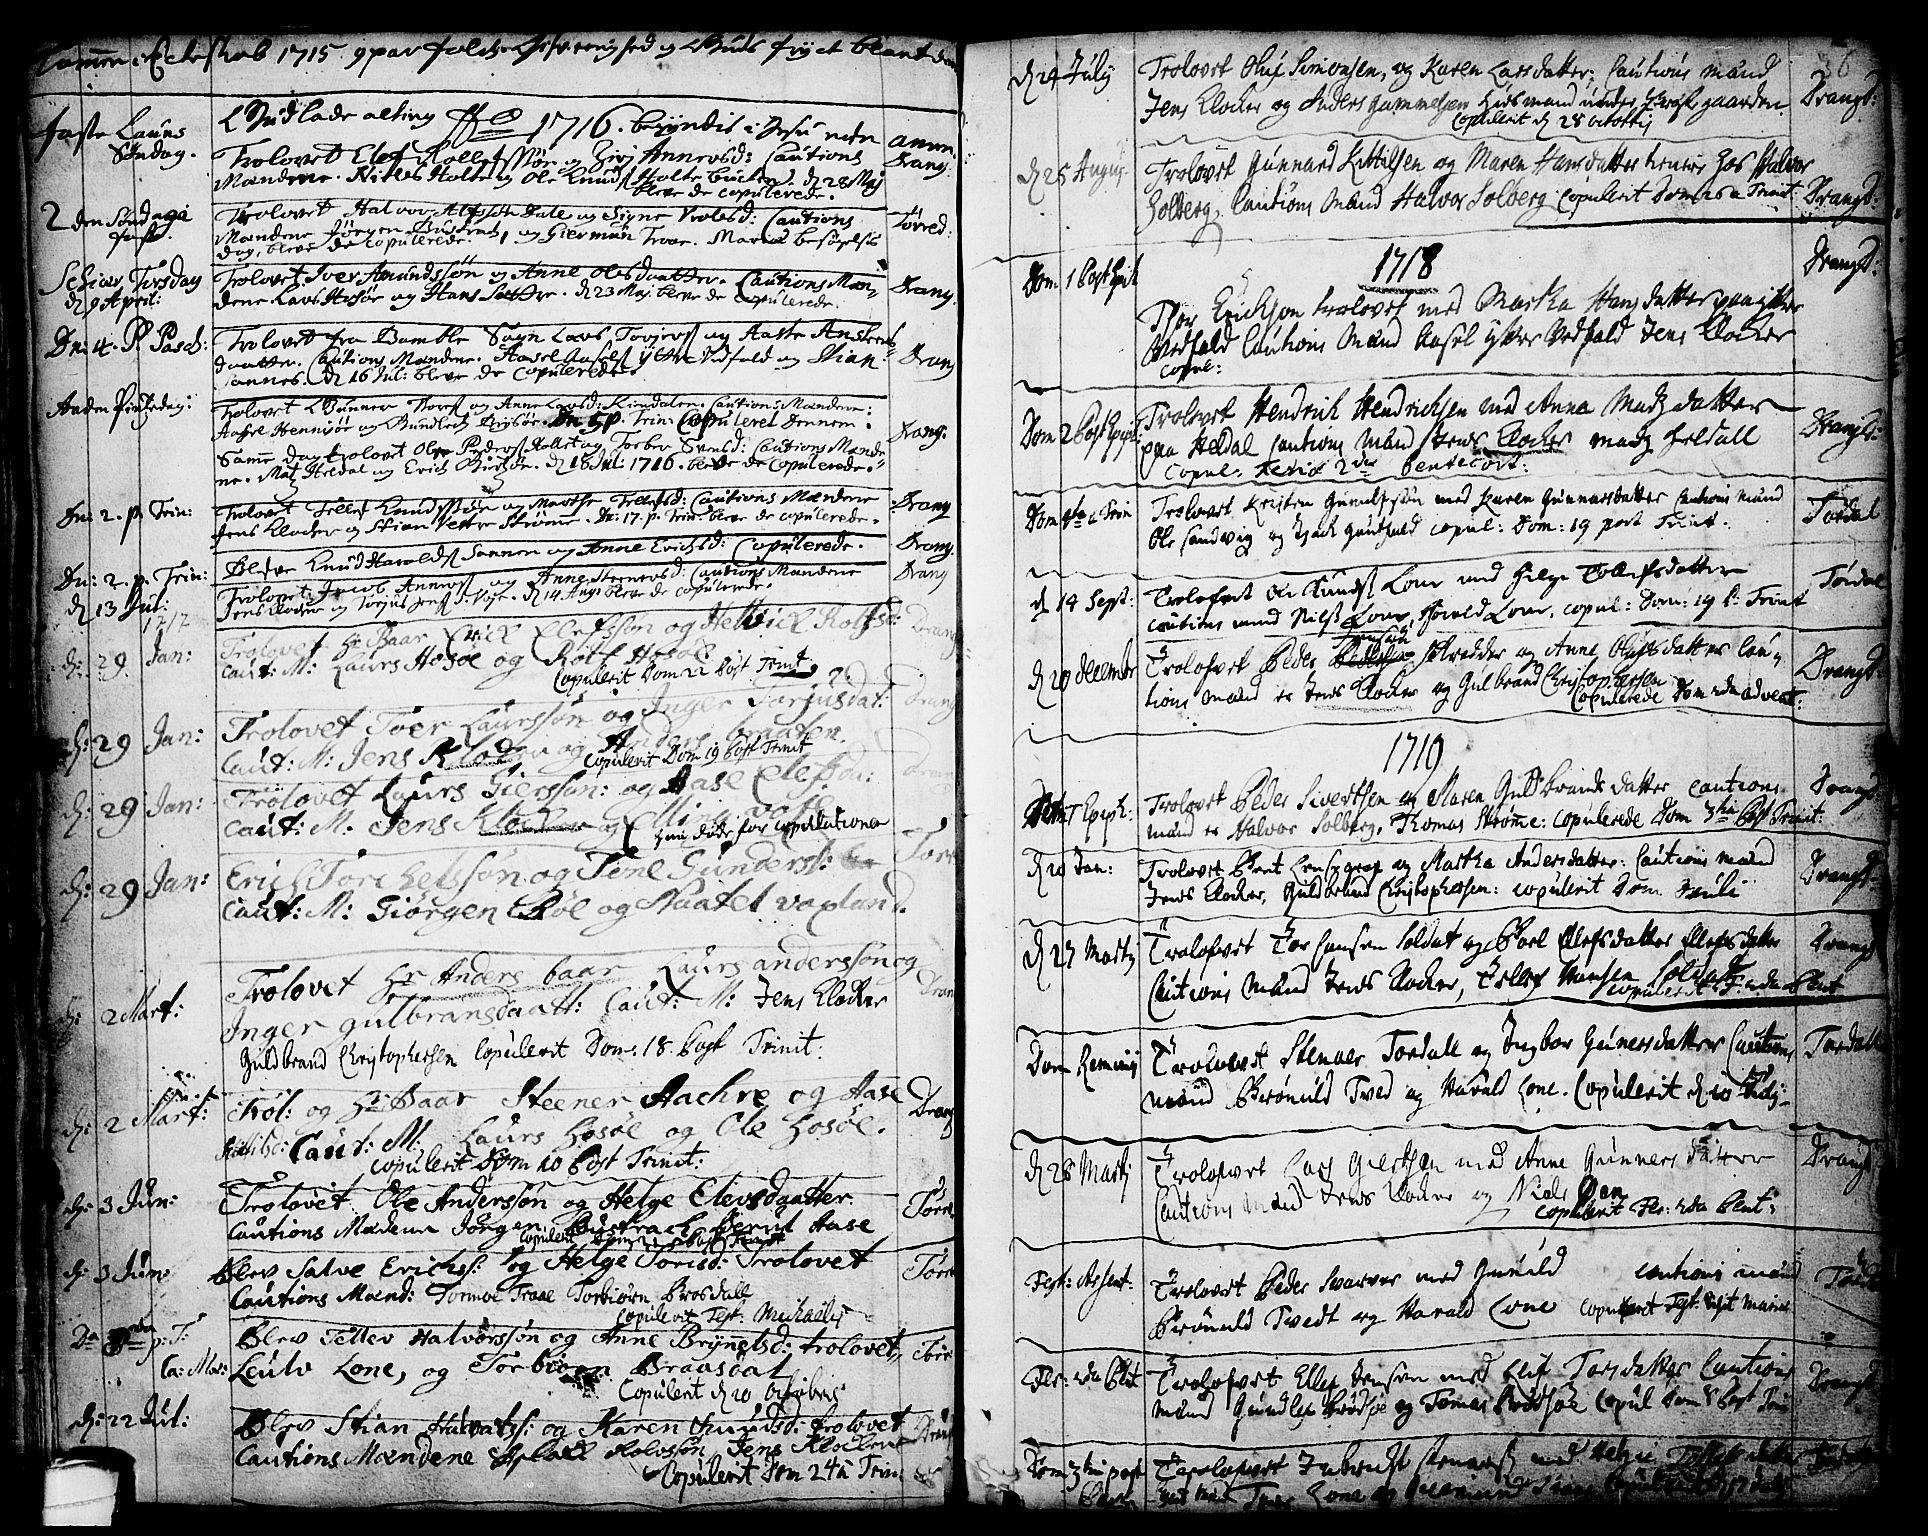 SAKO, Drangedal kirkebøker, F/Fa/L0001: Ministerialbok nr. 1, 1697-1767, s. 36